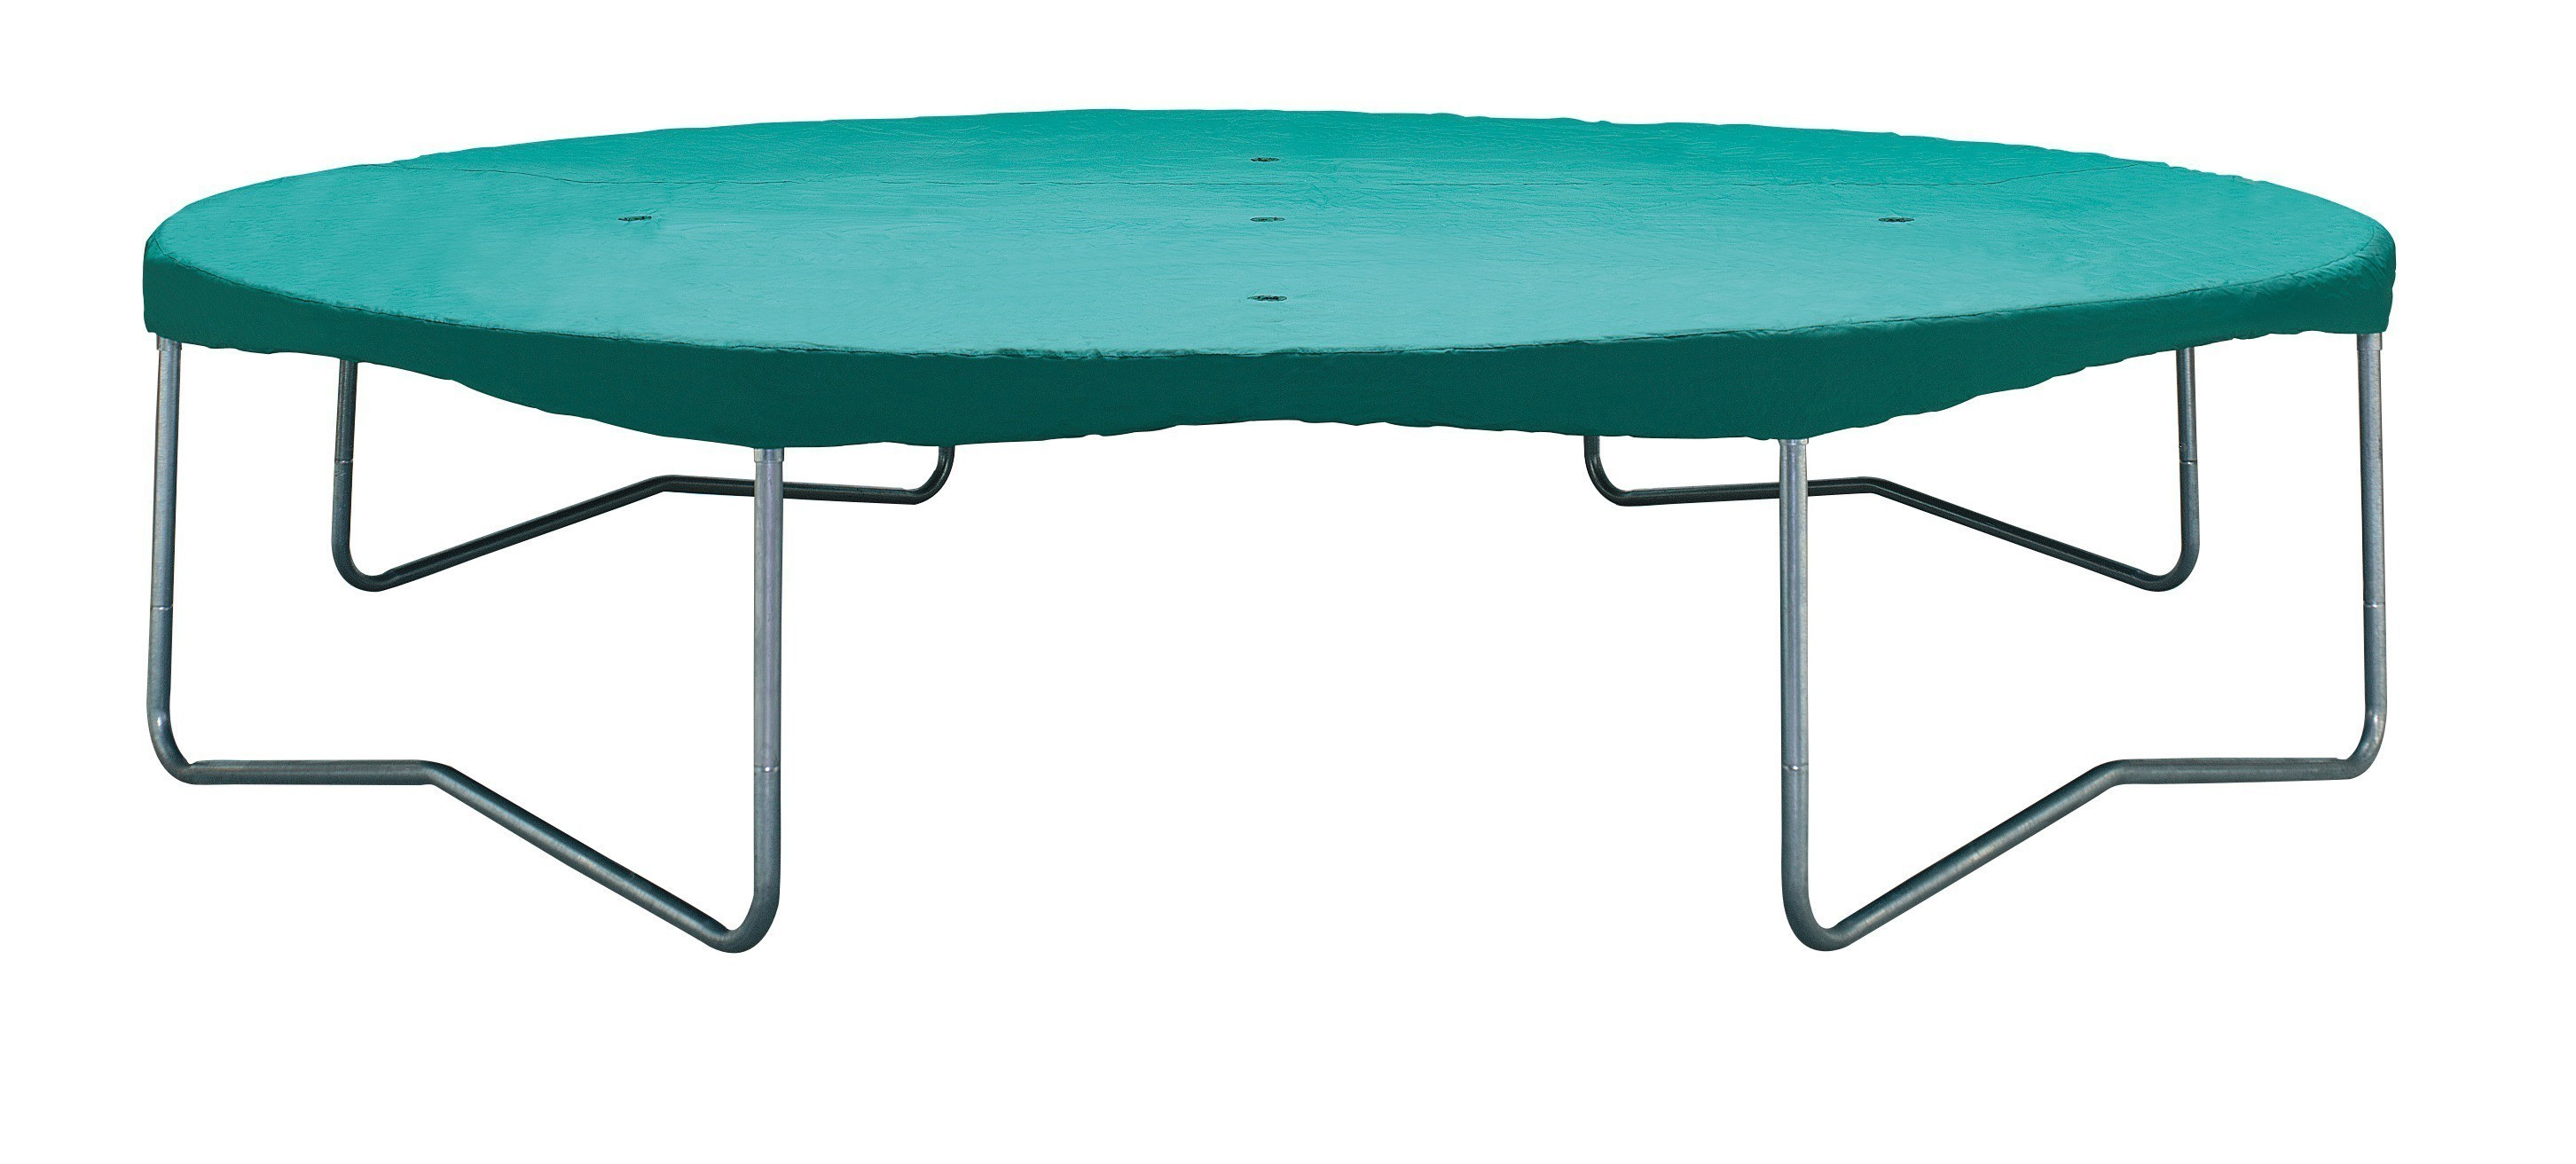 Schutzbezug Extra 330 grün für Trampolin BERG toys Bild 1